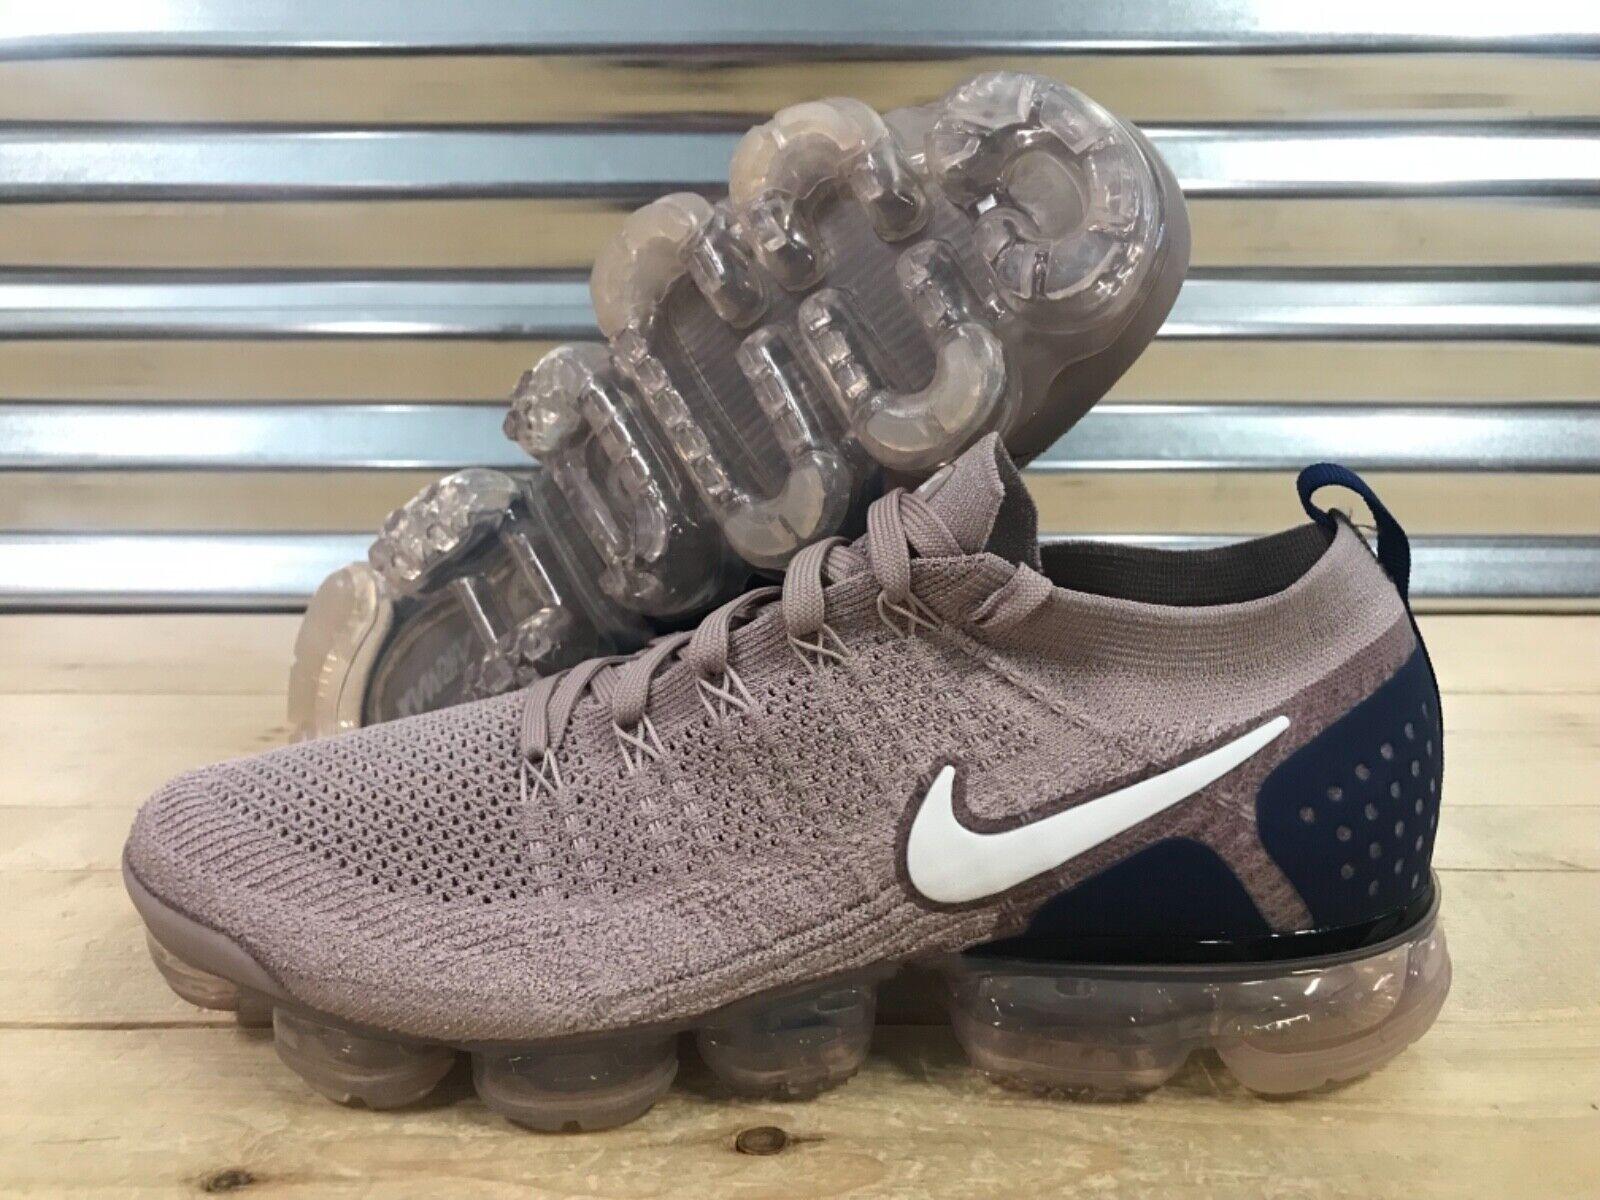 Nike Nike Nike Air Vapormax Flyknit 2 Running schuhe Diffused Taupe Blau SZ ( 942842-201 ) 22177b